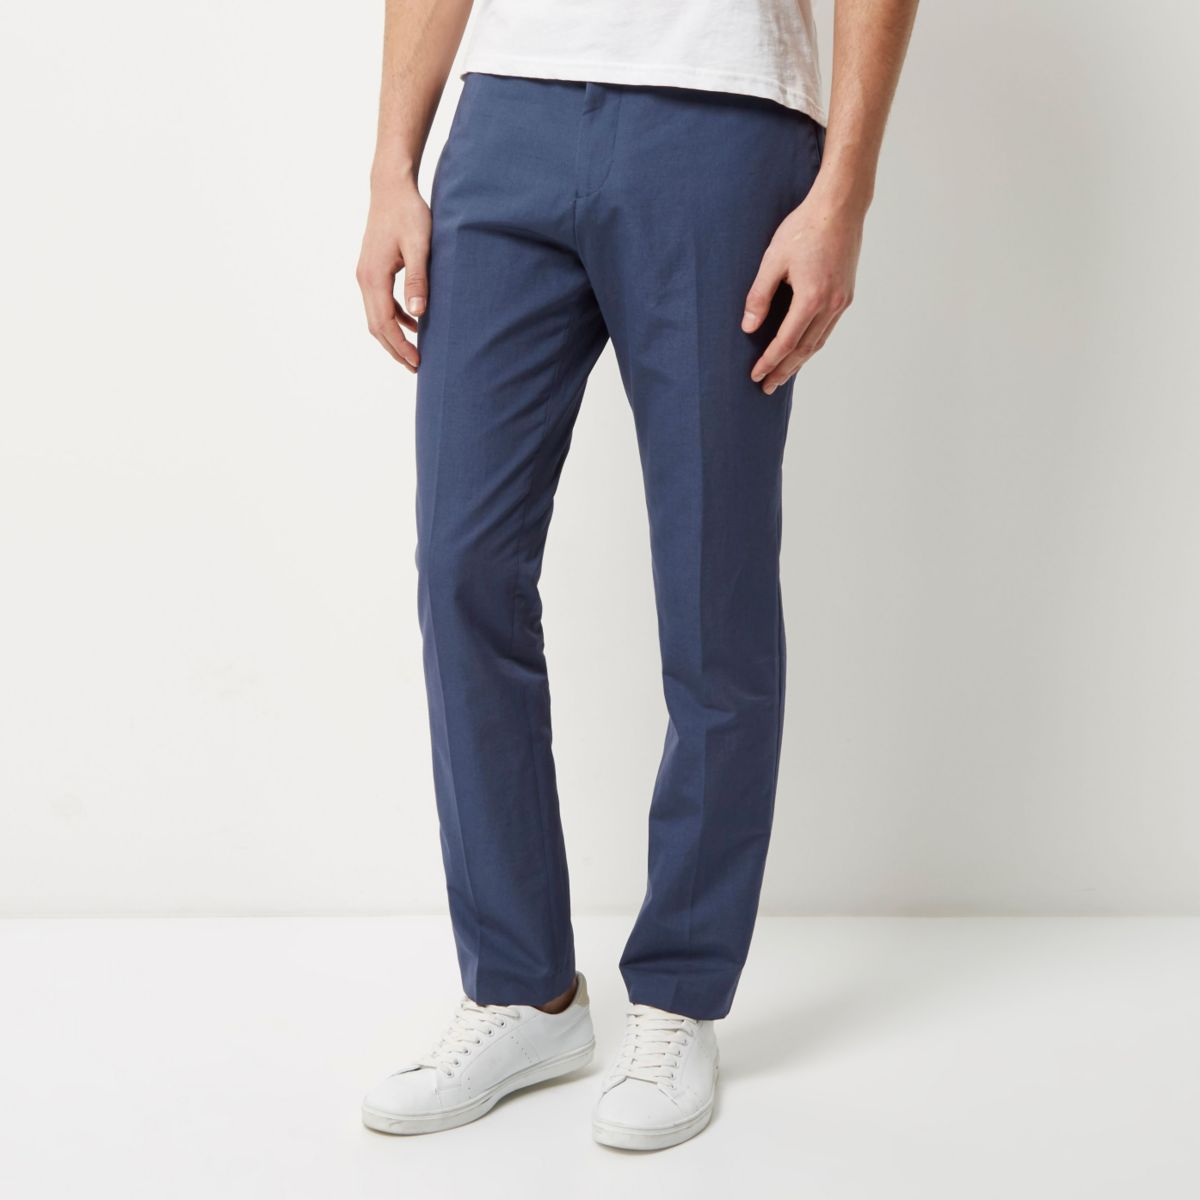 Blue smart slim elastic waist trousers